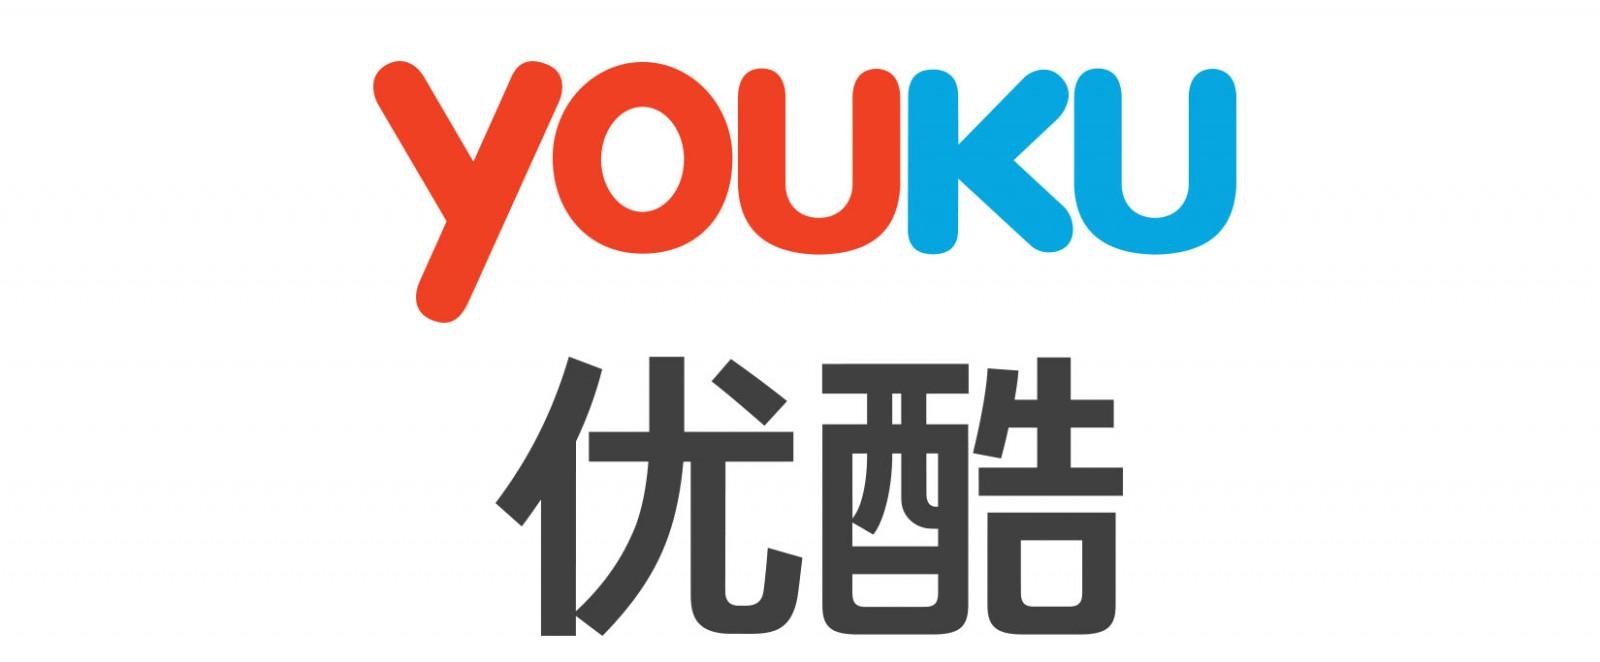 Vega Youku Channel